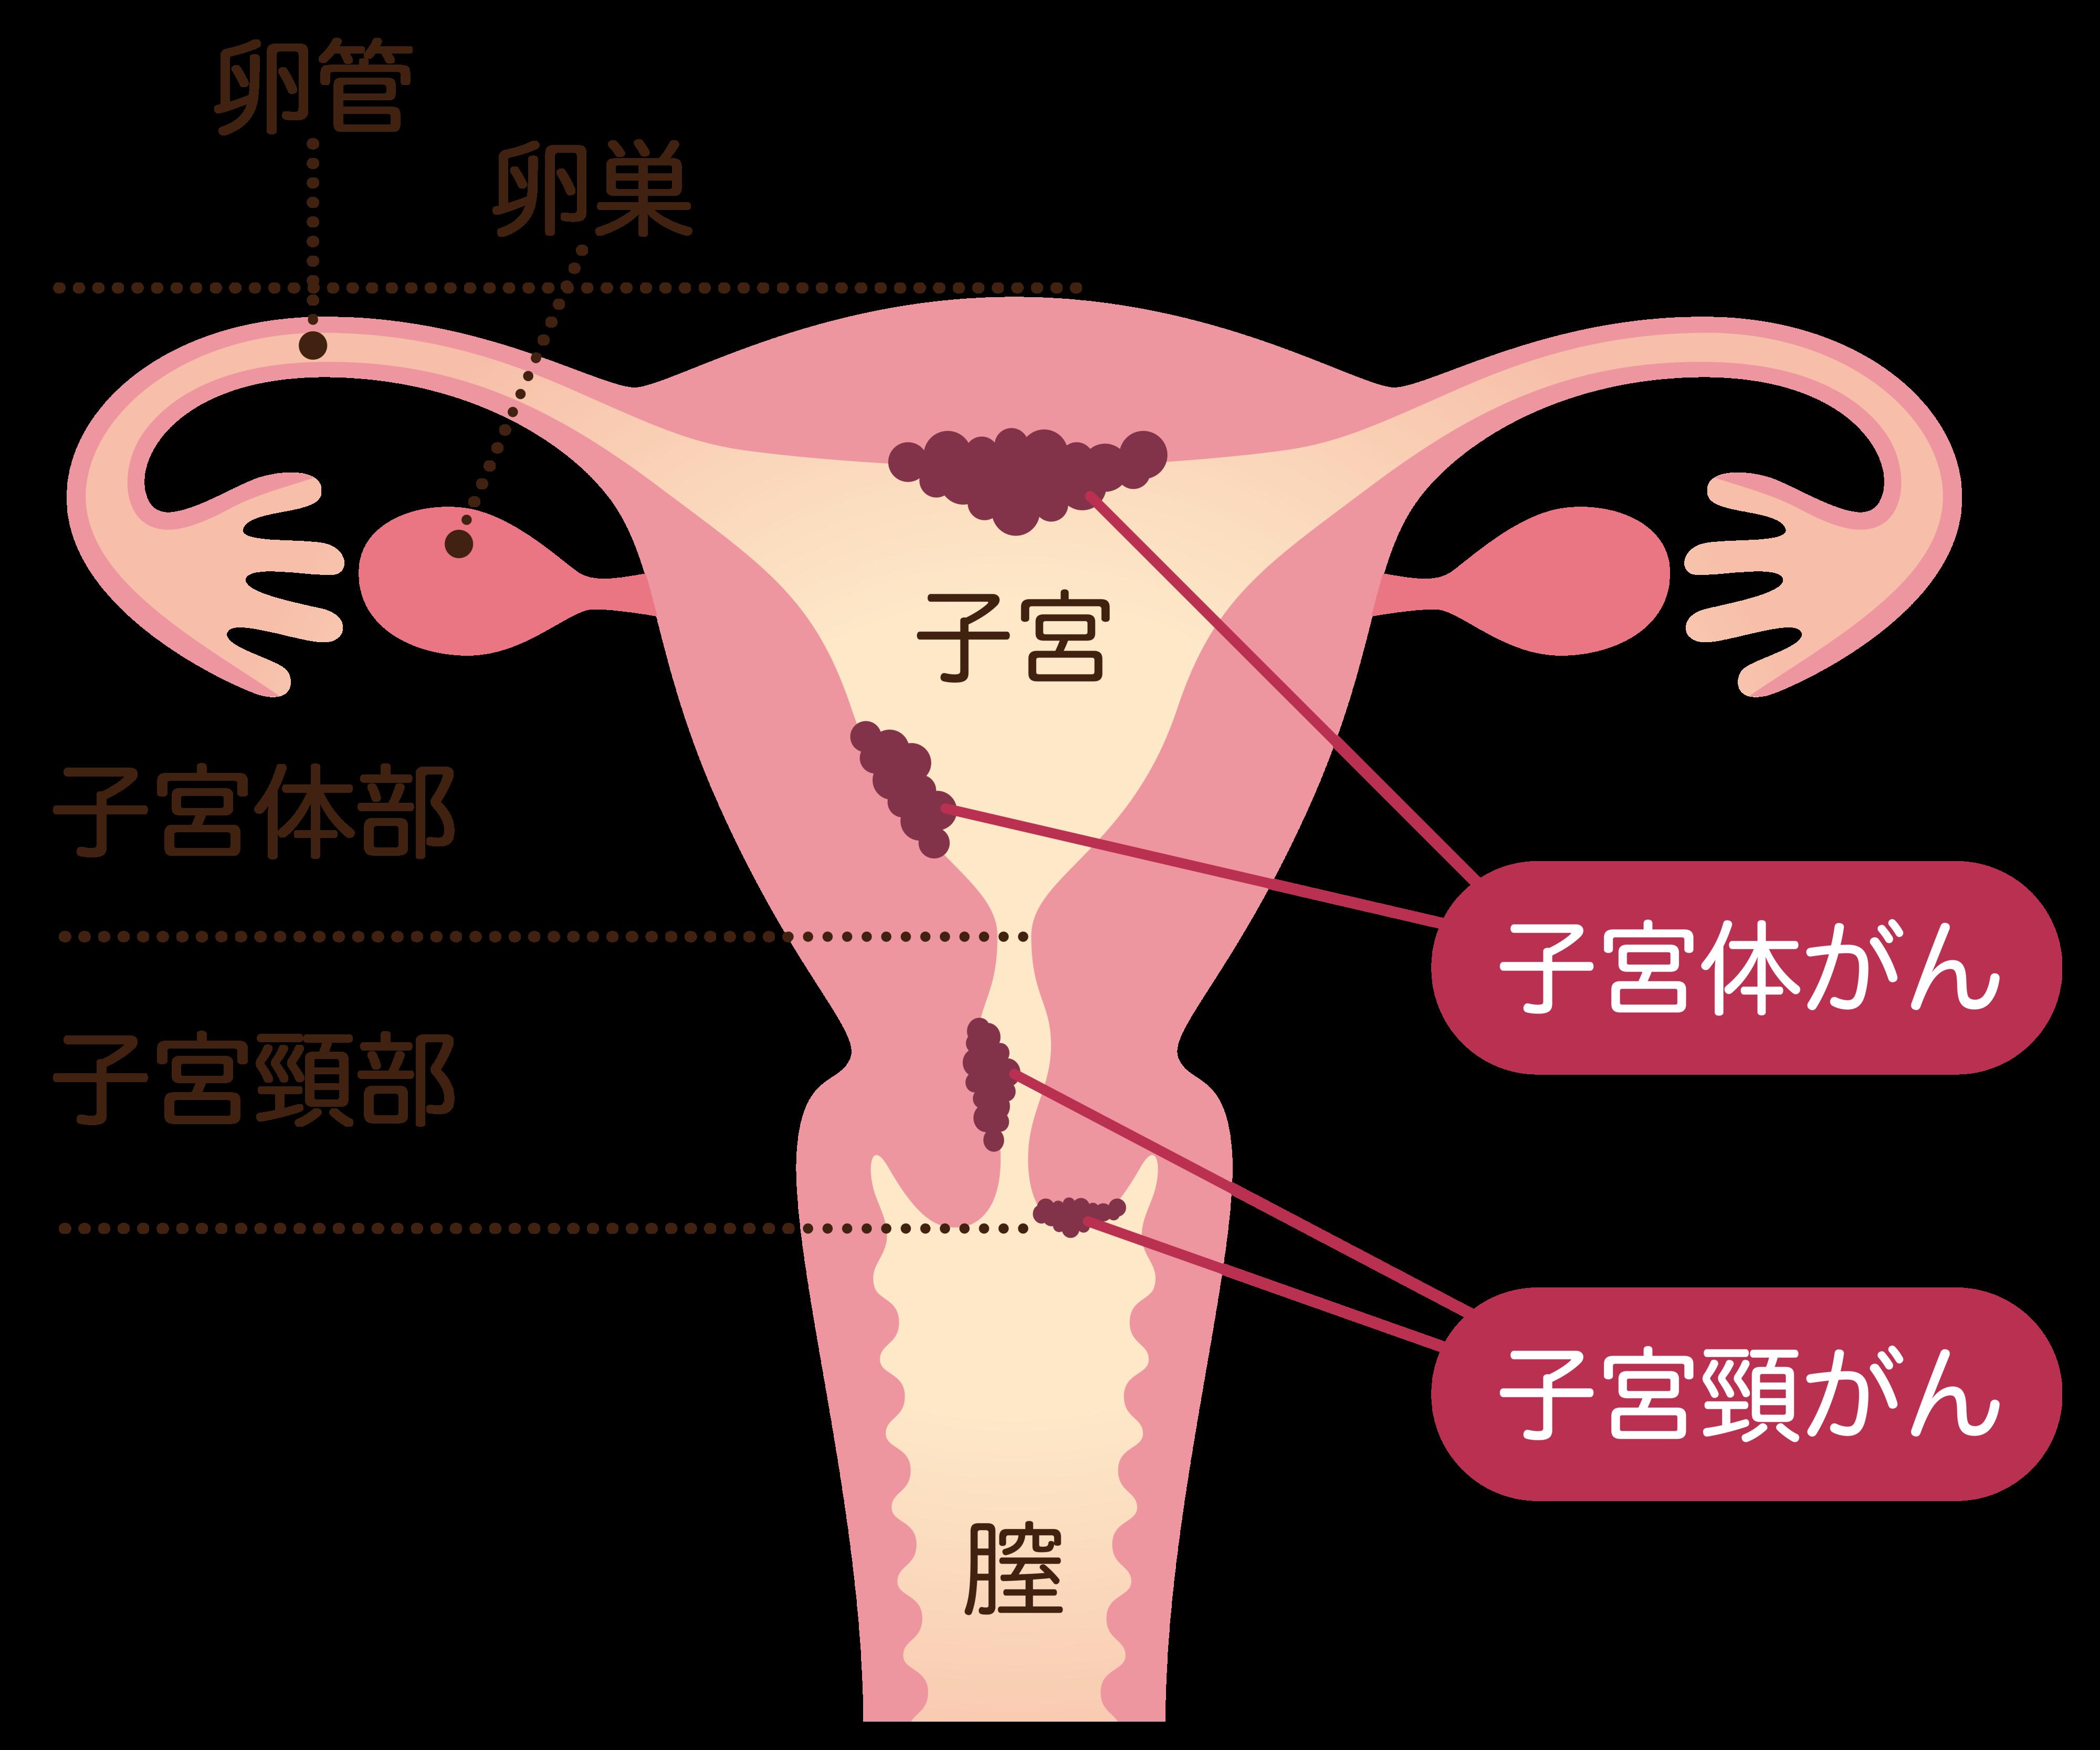 続く 出血 妊娠 初期